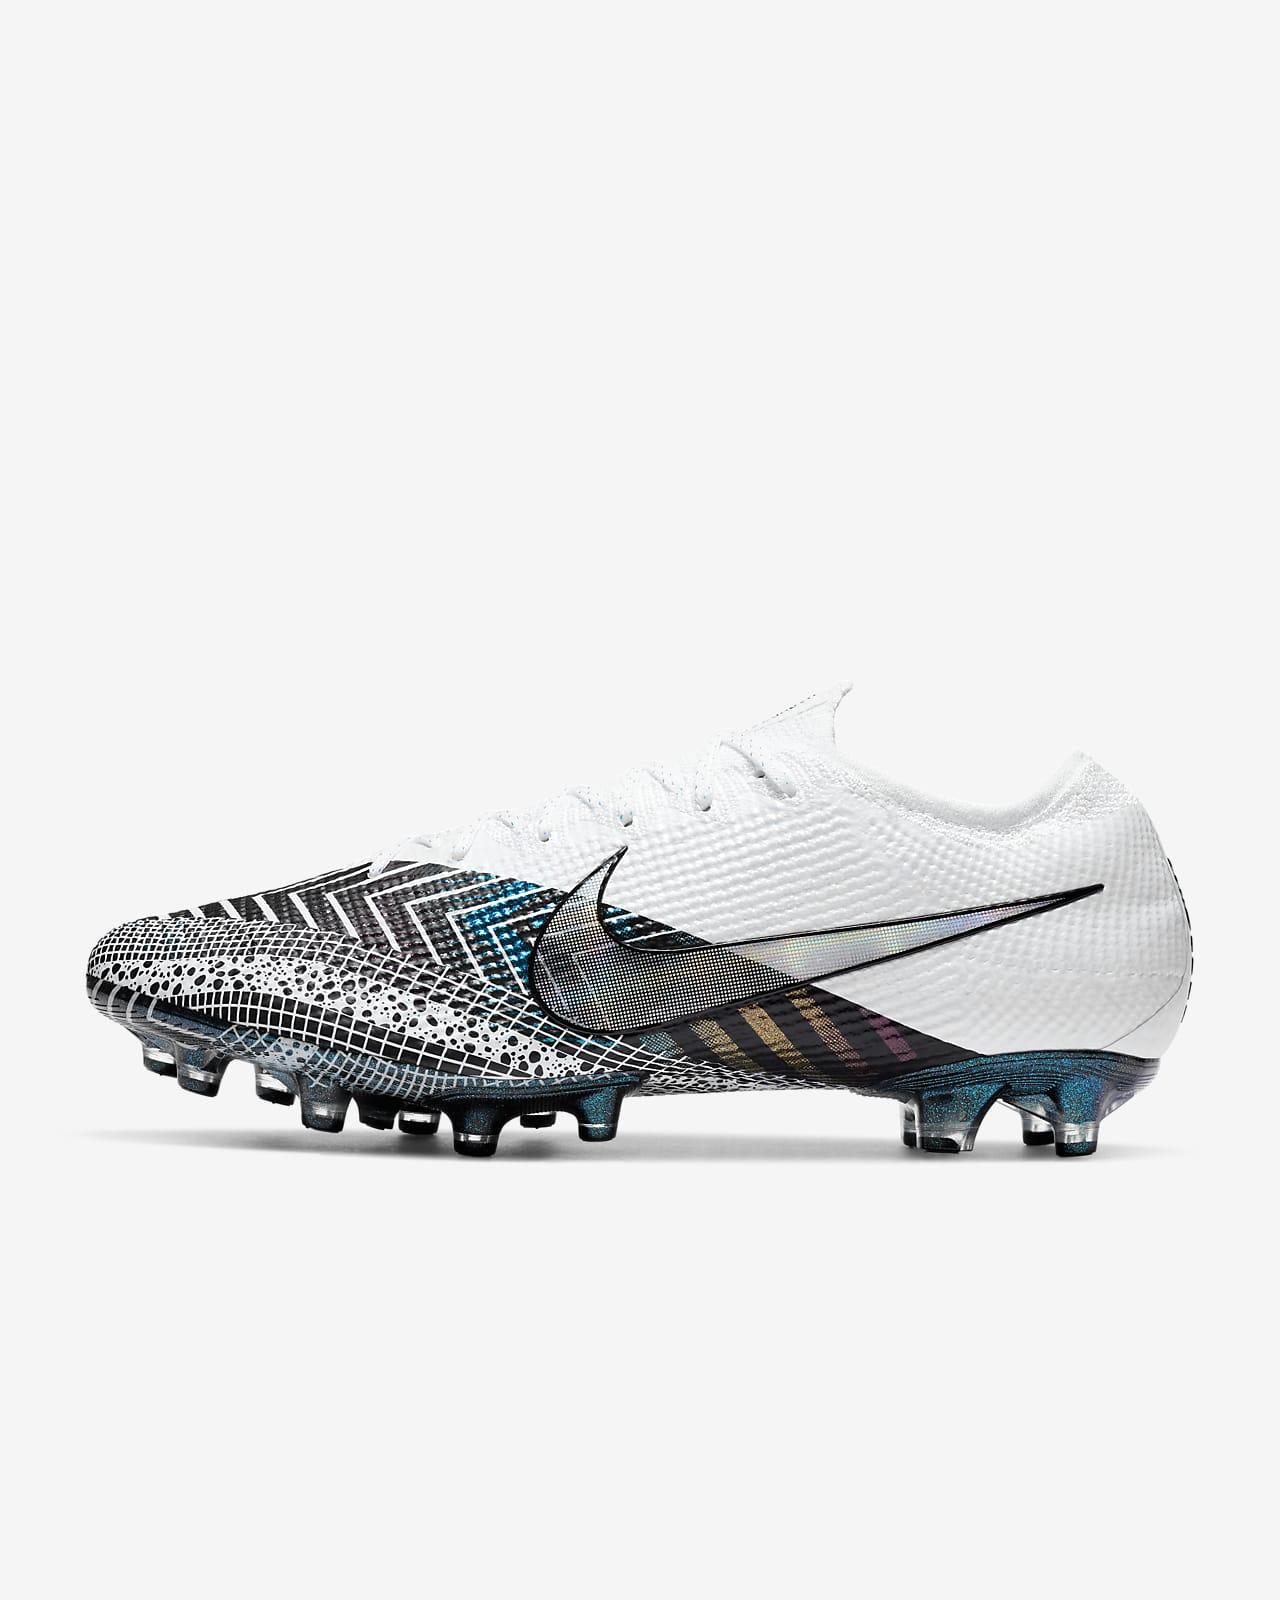 Nike Mercurial Vapor 13 Elite MDS AG